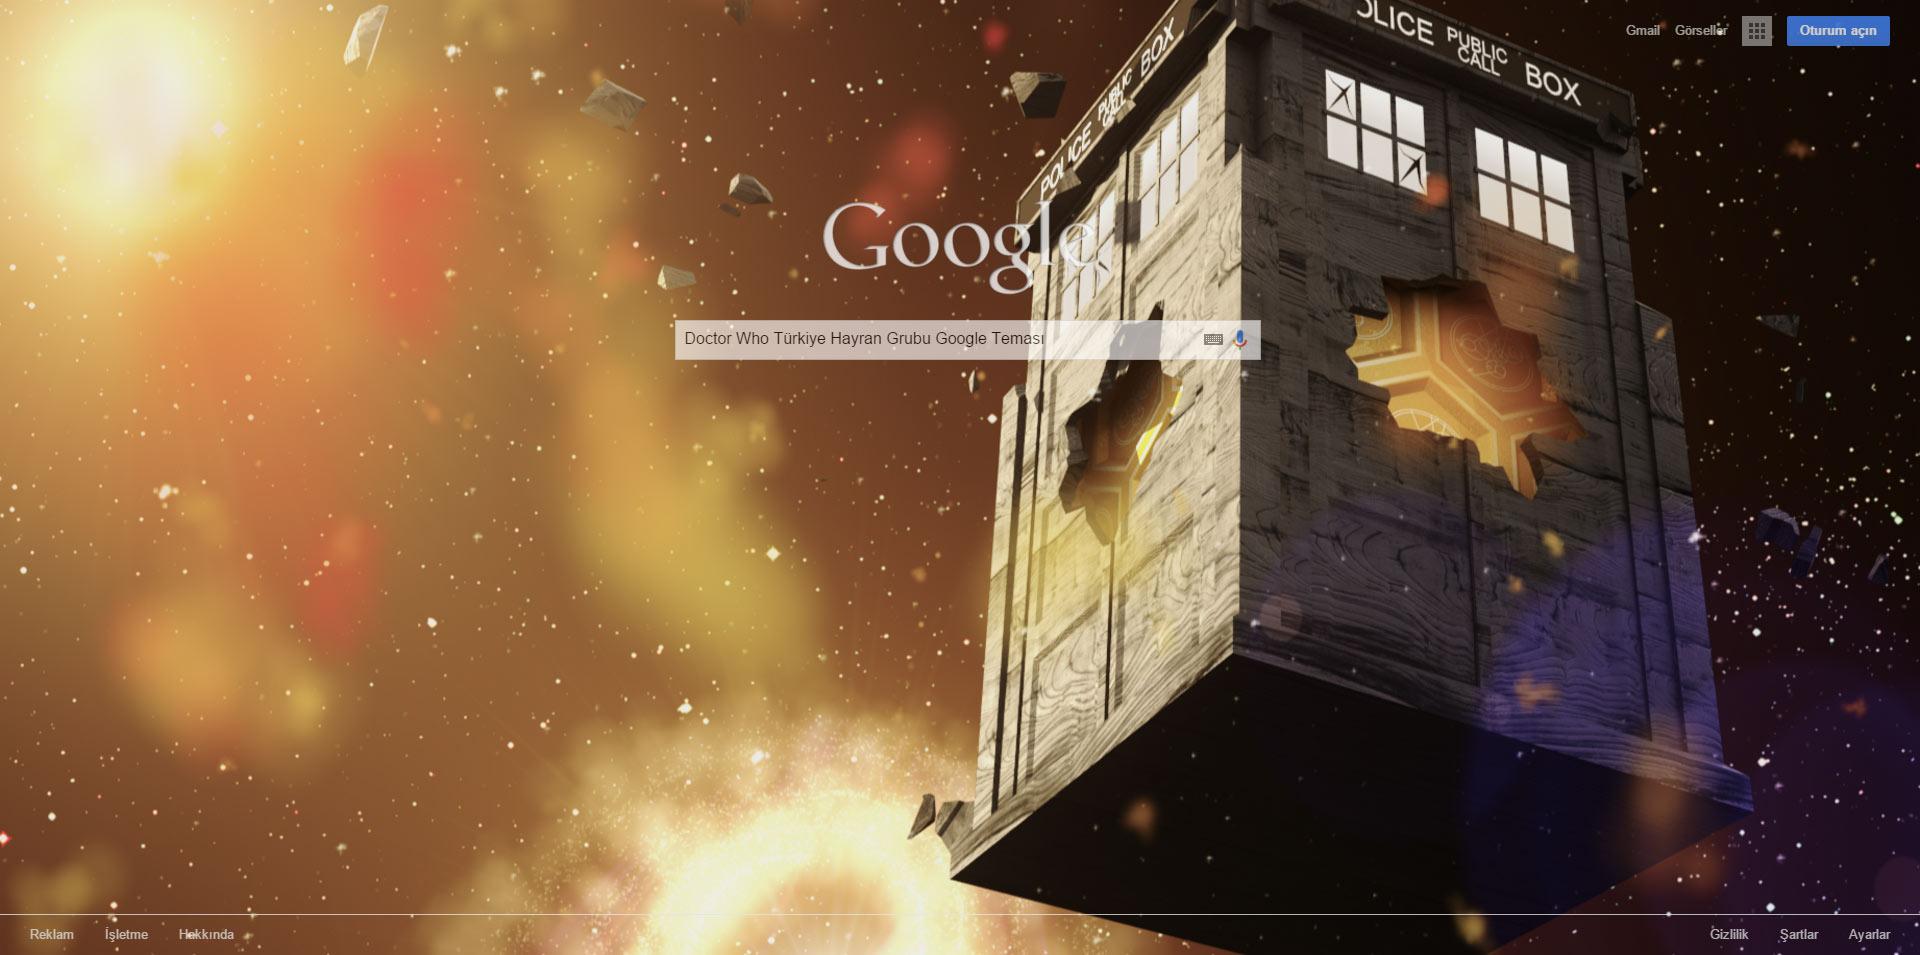 Google themes doctor who - Doctor Who T Rkiye Hayran Grubu Google Temas